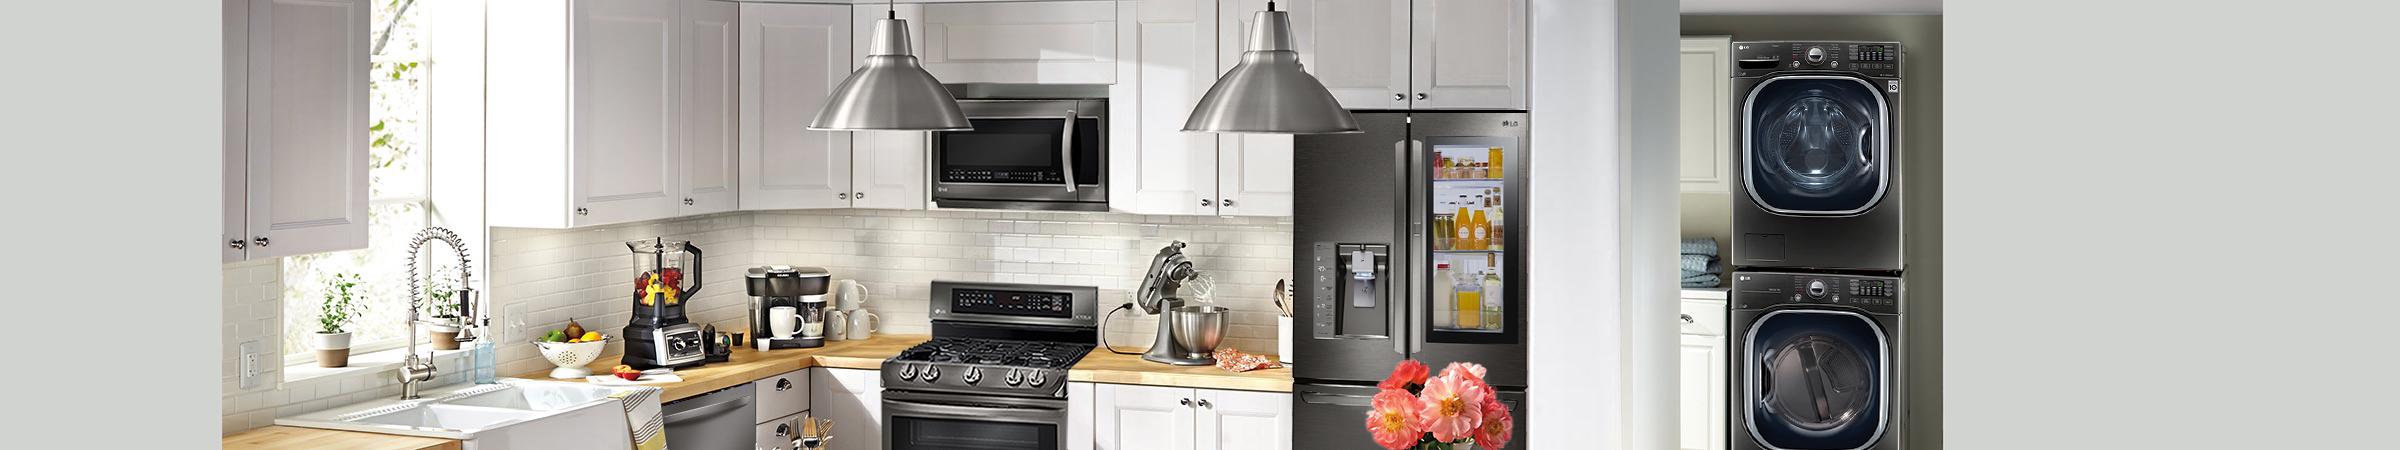 lg kitchen appliances home depot backsplash tiles for appliance options best buy the of